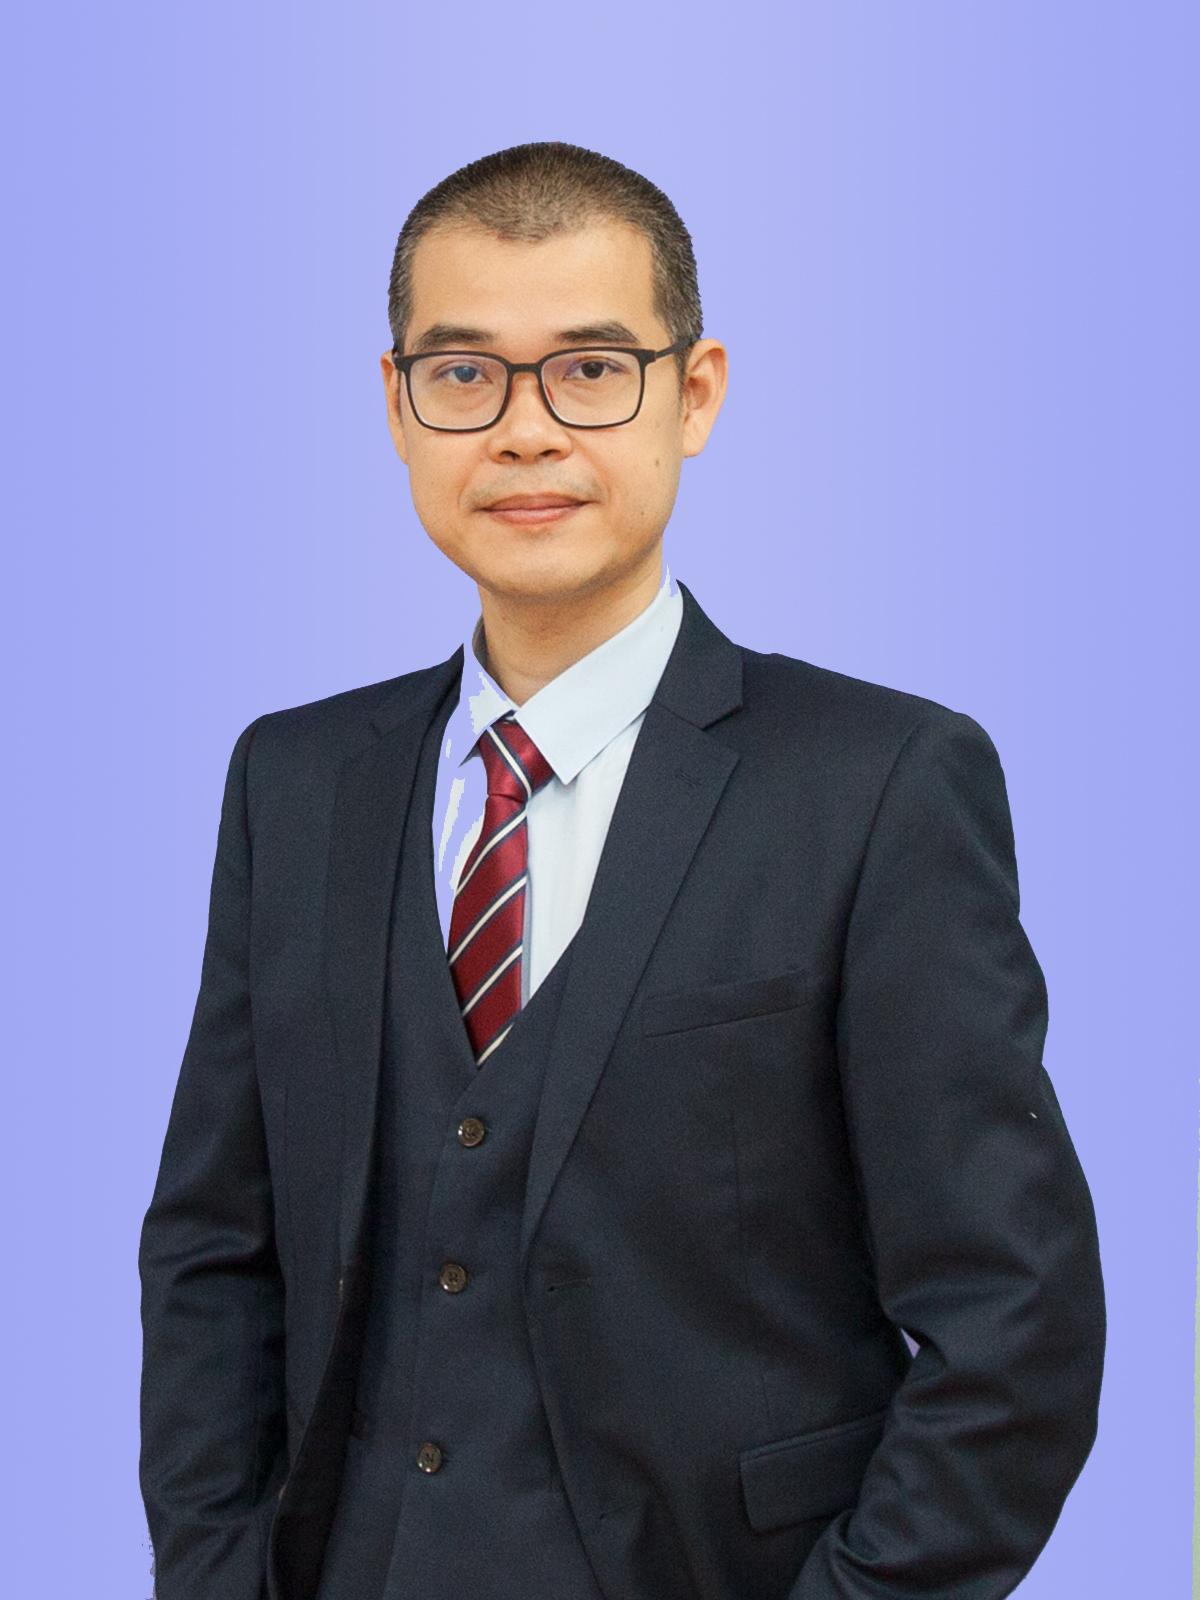 Assistant Professor Dr. Pedithep Youyuenyong